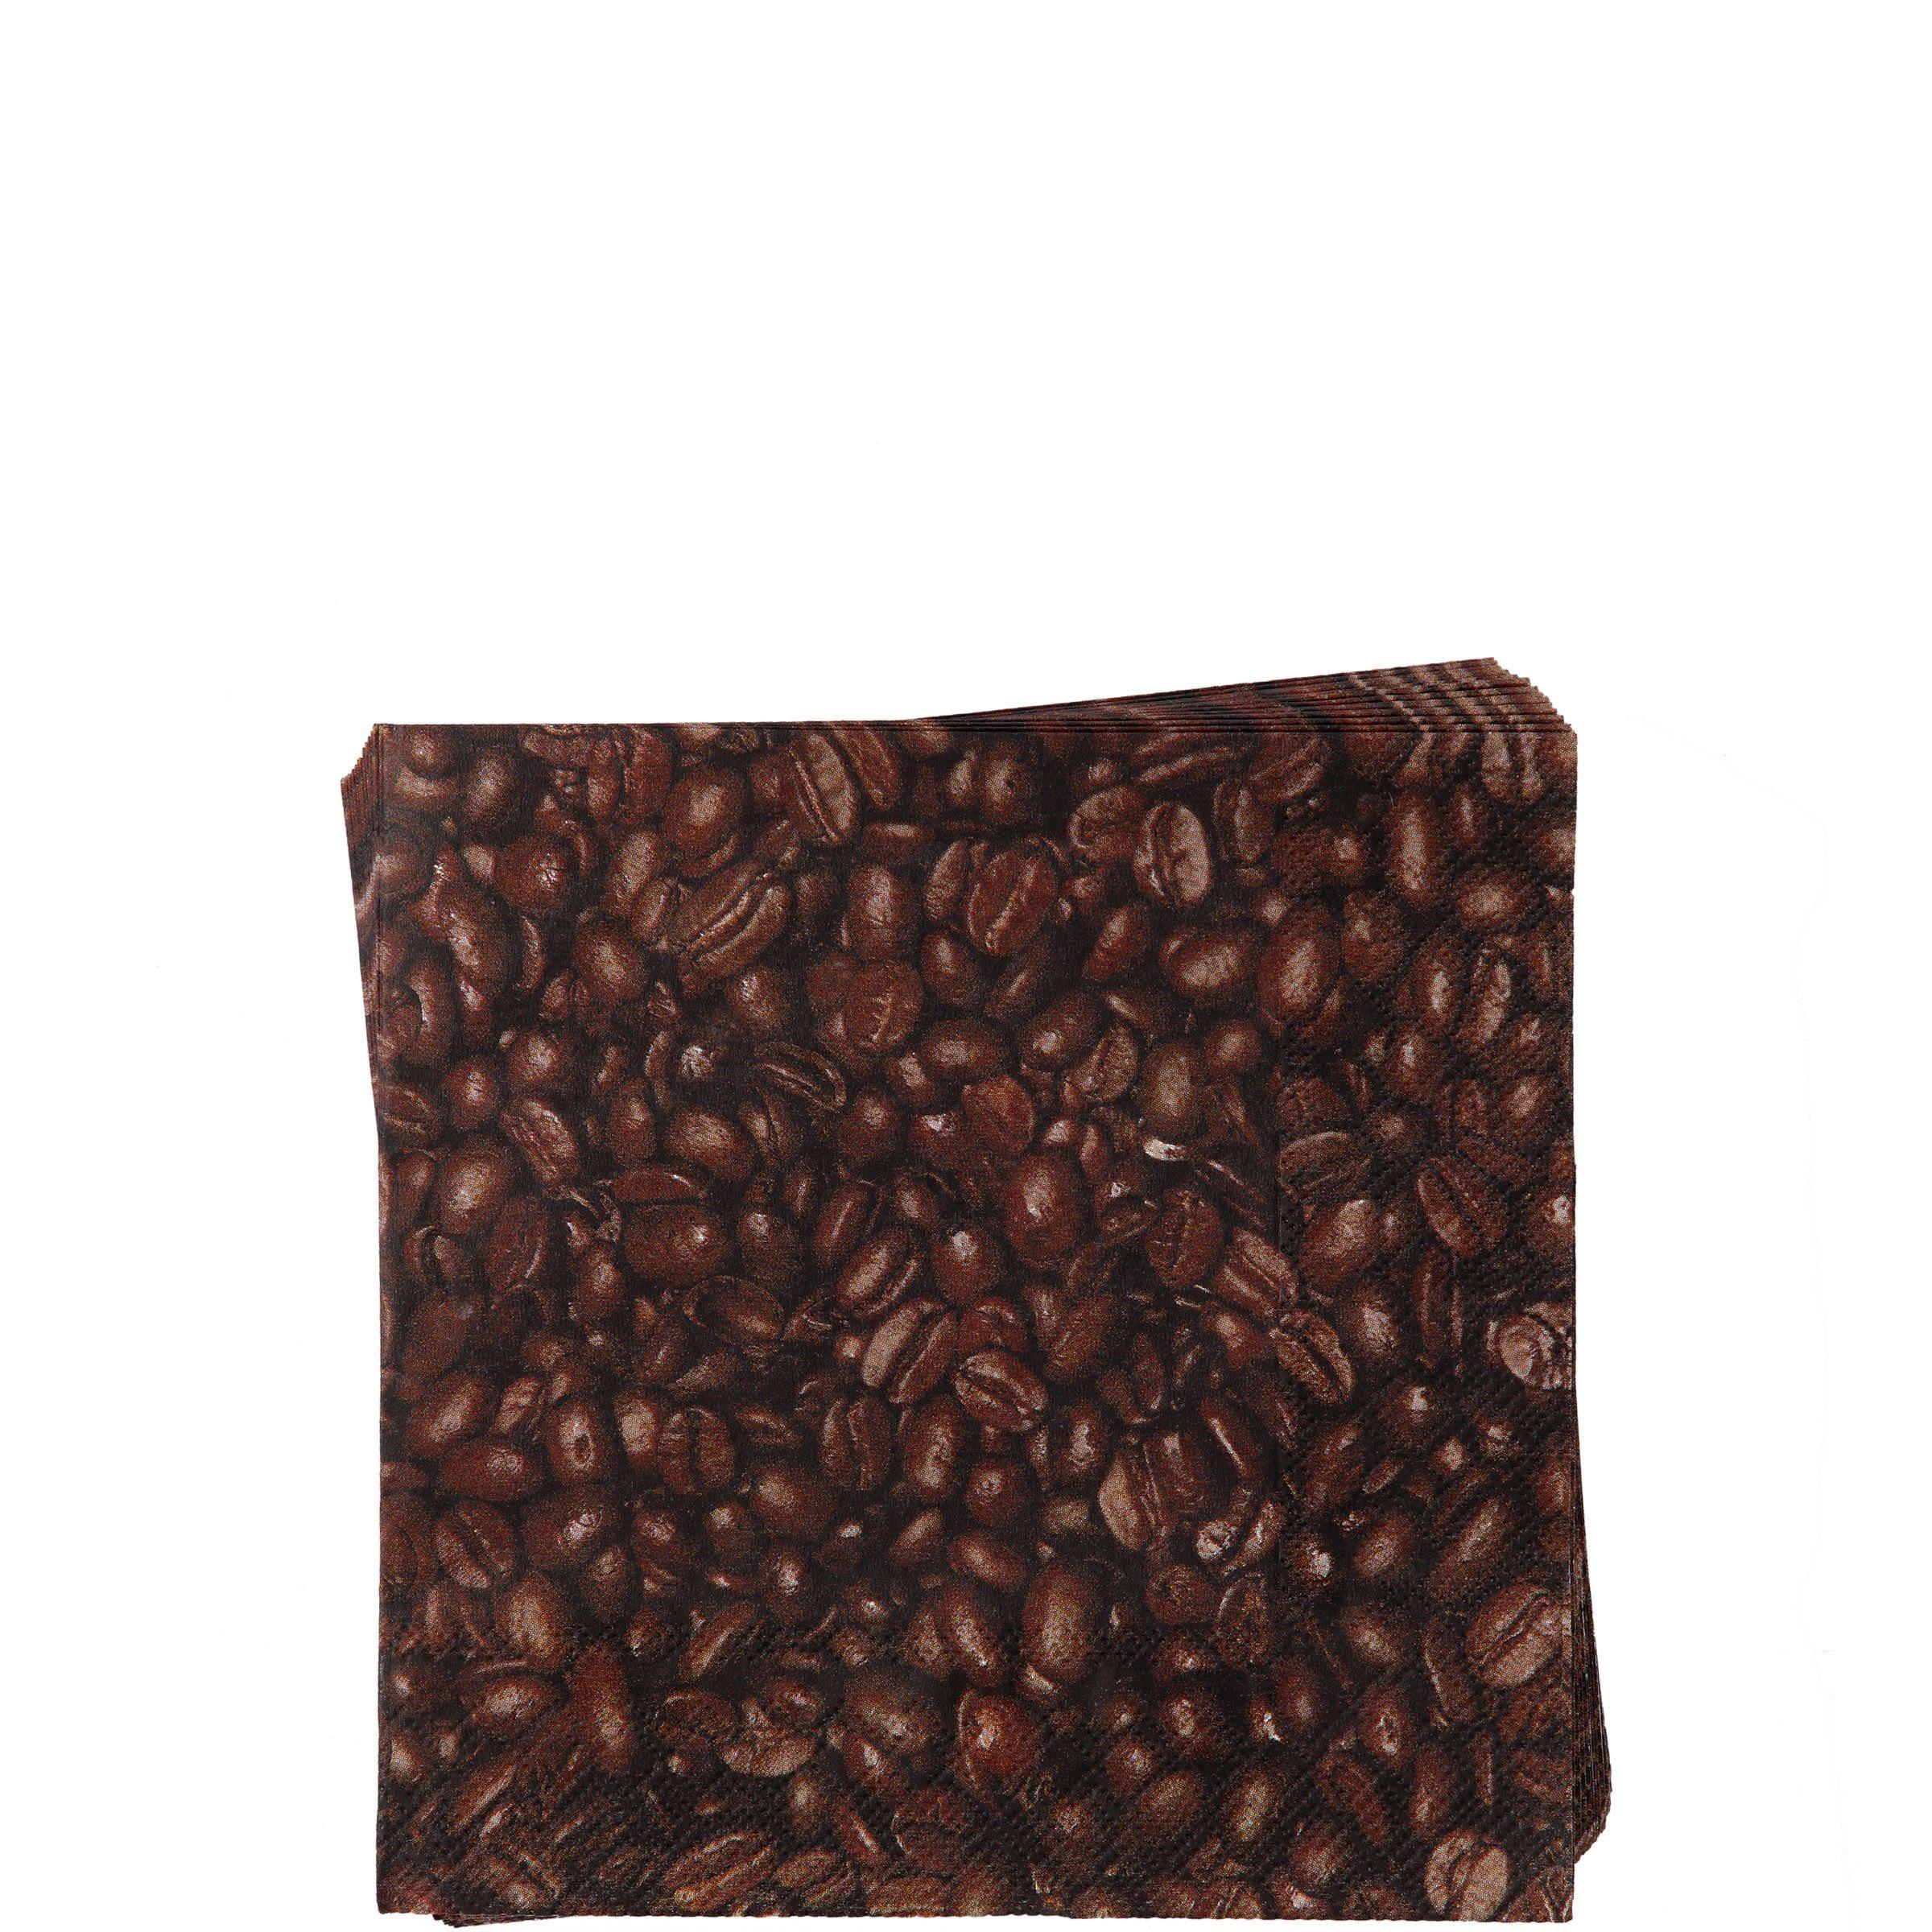 BUTLERS APRÈS »Cocktailserviette Kaffeebohnen«